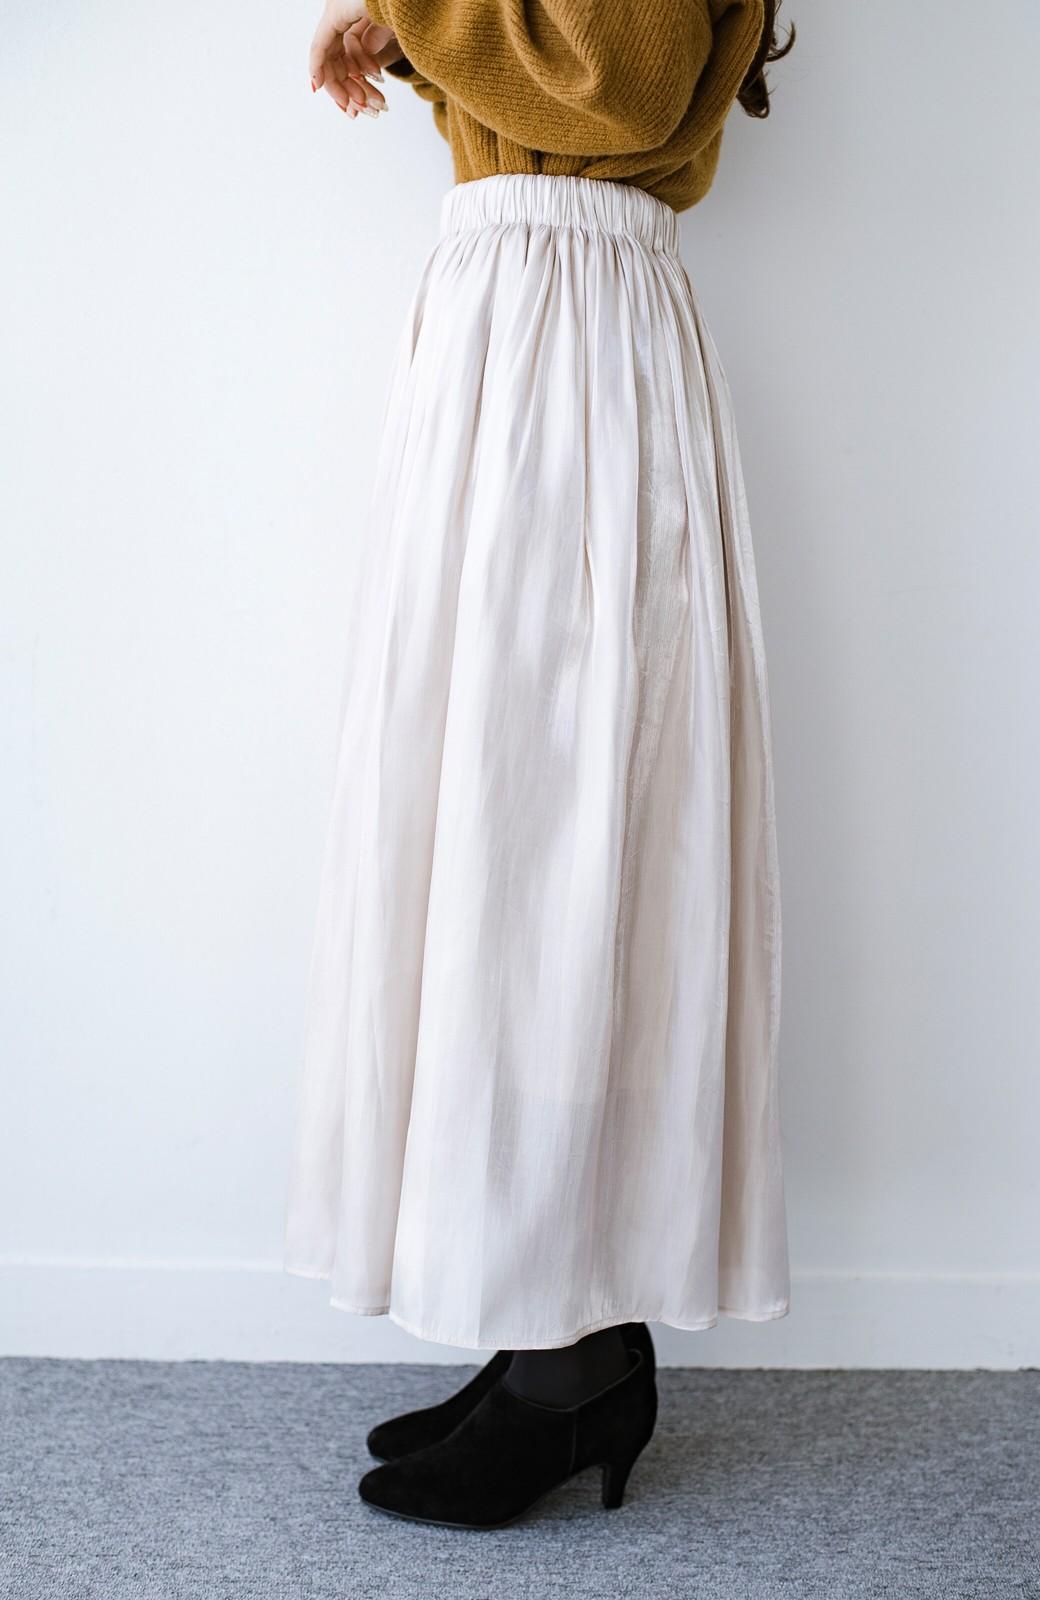 haco! 【人気のため新色追加!】1枚でも重ね着にも便利なキラキラ素材がかわいいロングスカート by laulea <アイボリー>の商品写真6